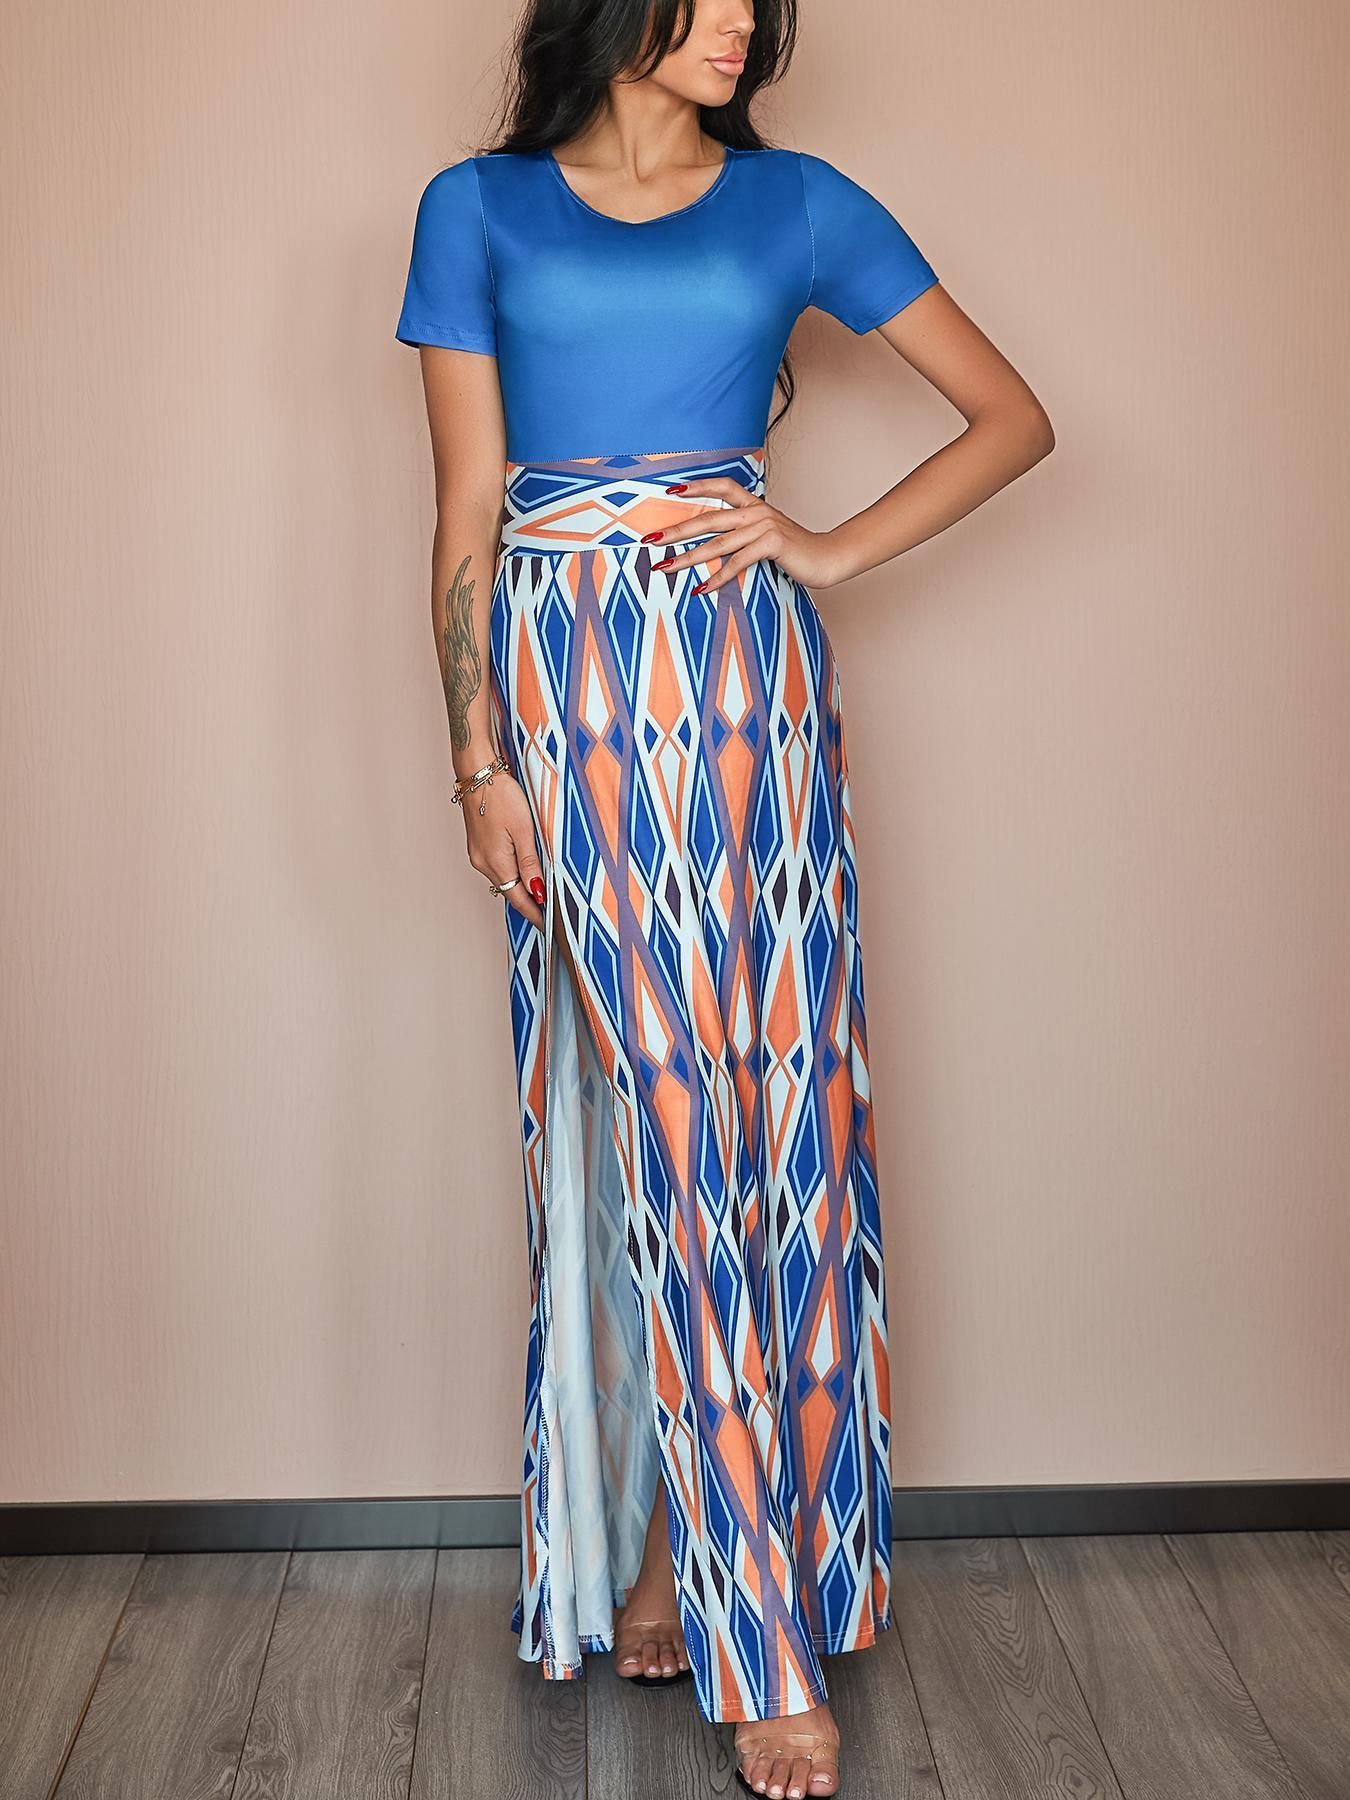 Splicing Retro Style High Slit Maxi Dress фото